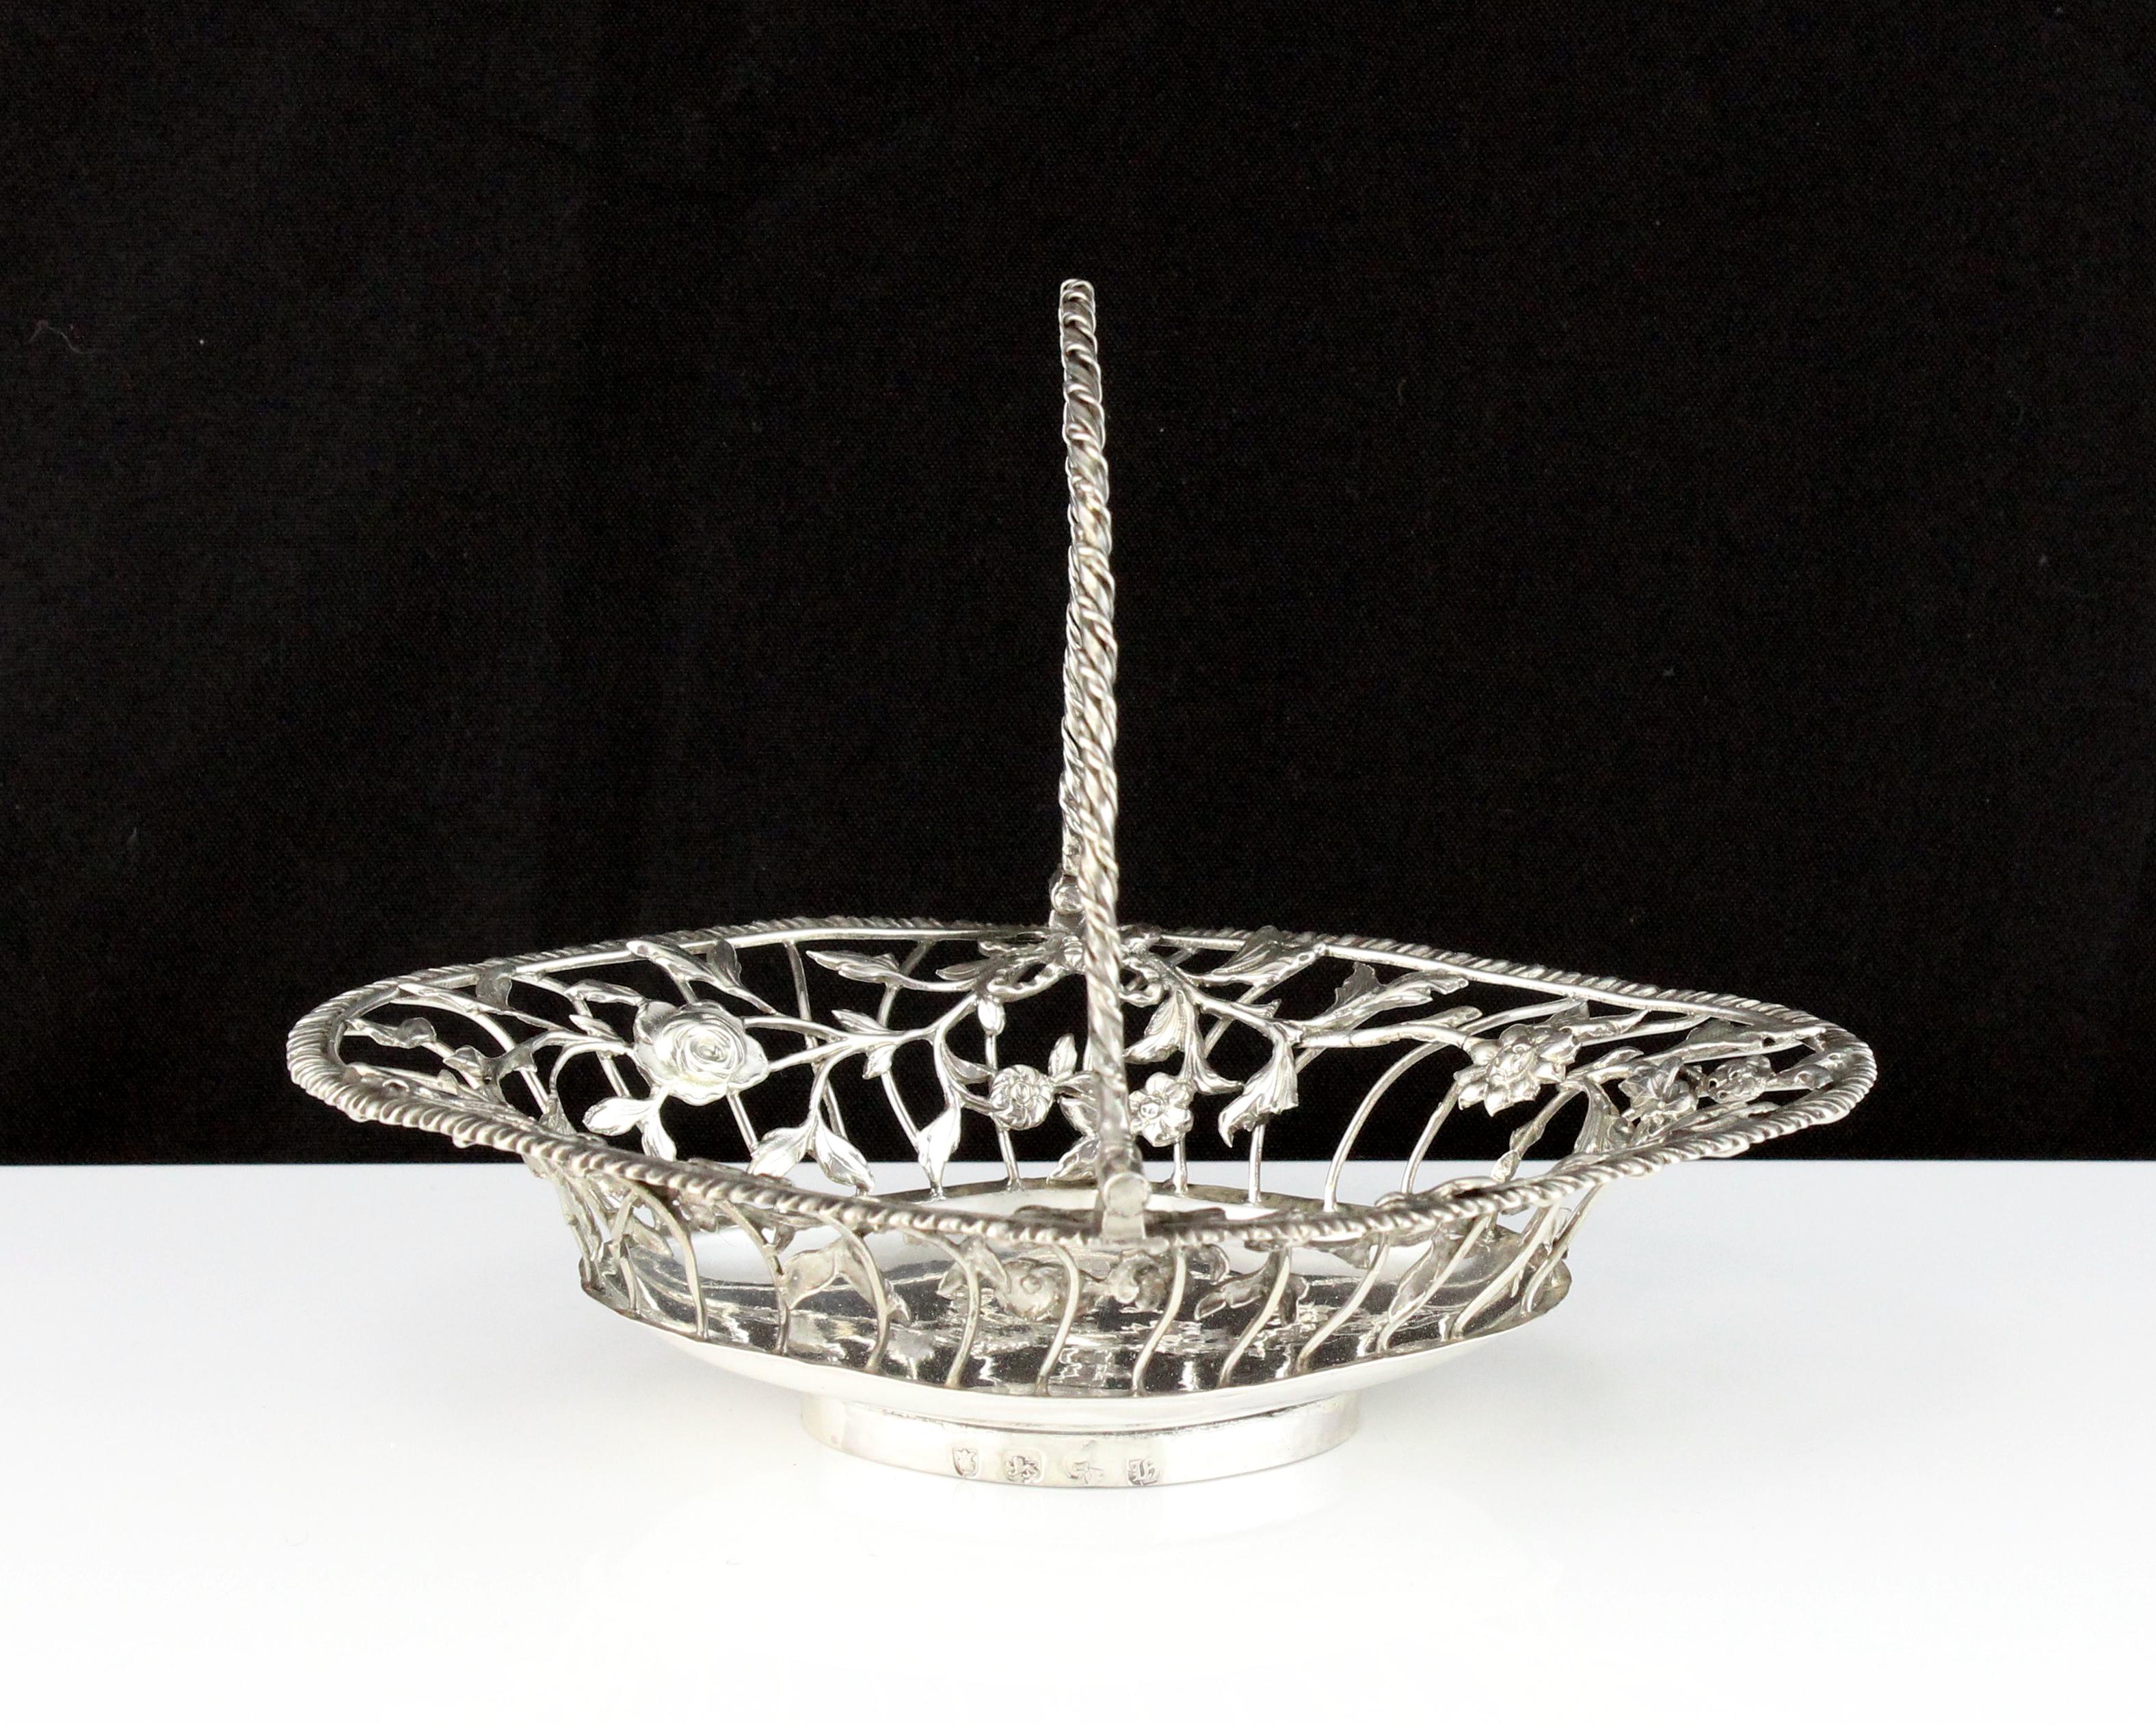 An antique George III Sterling Silver bon bon basket by Lutwyche & Vere, London, 1763 of navette